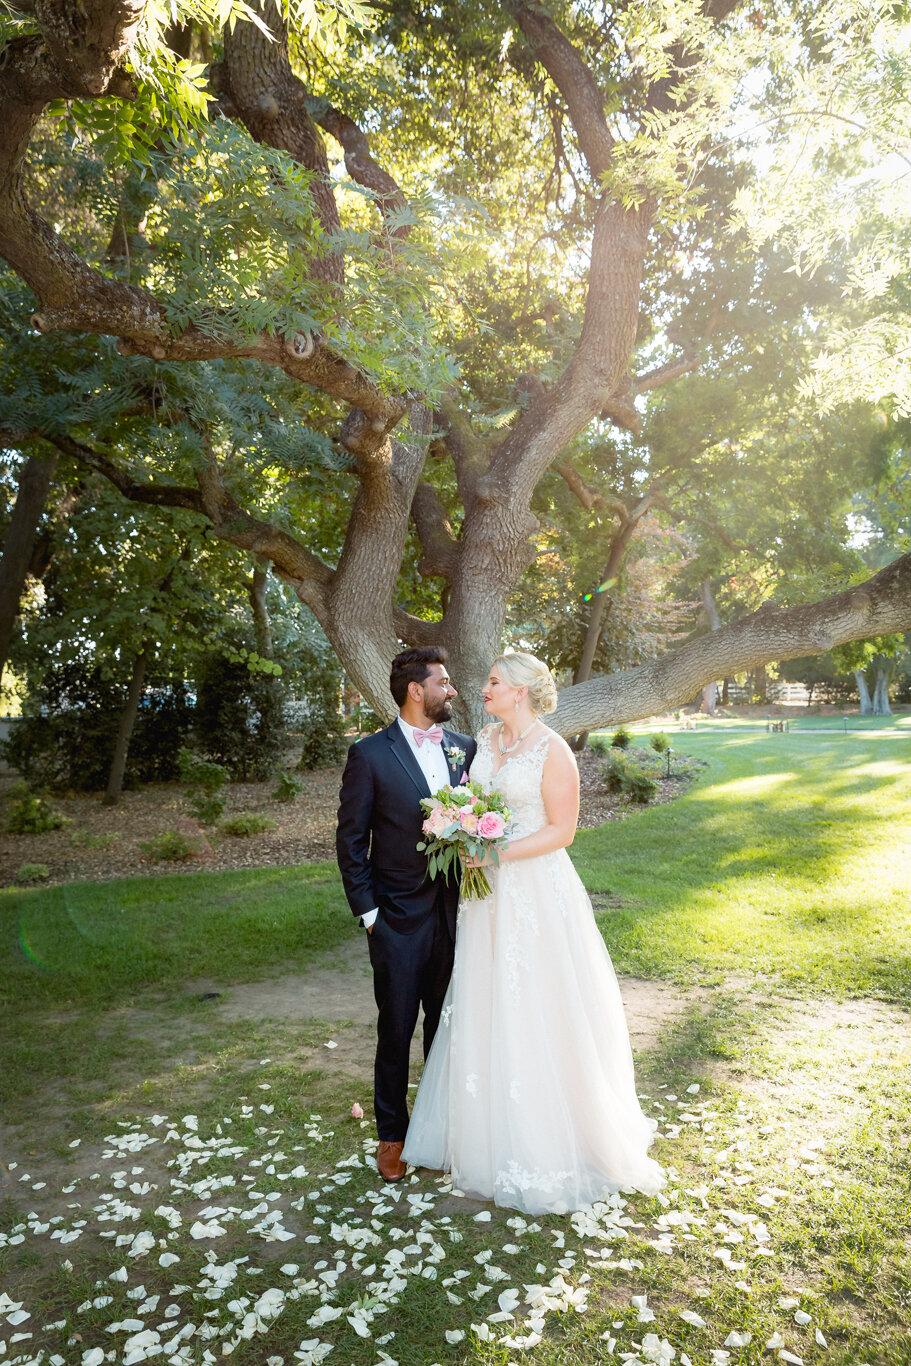 2019.08.24_Emily-Ashir-Wedding-at-the-Maples-6066.jpg